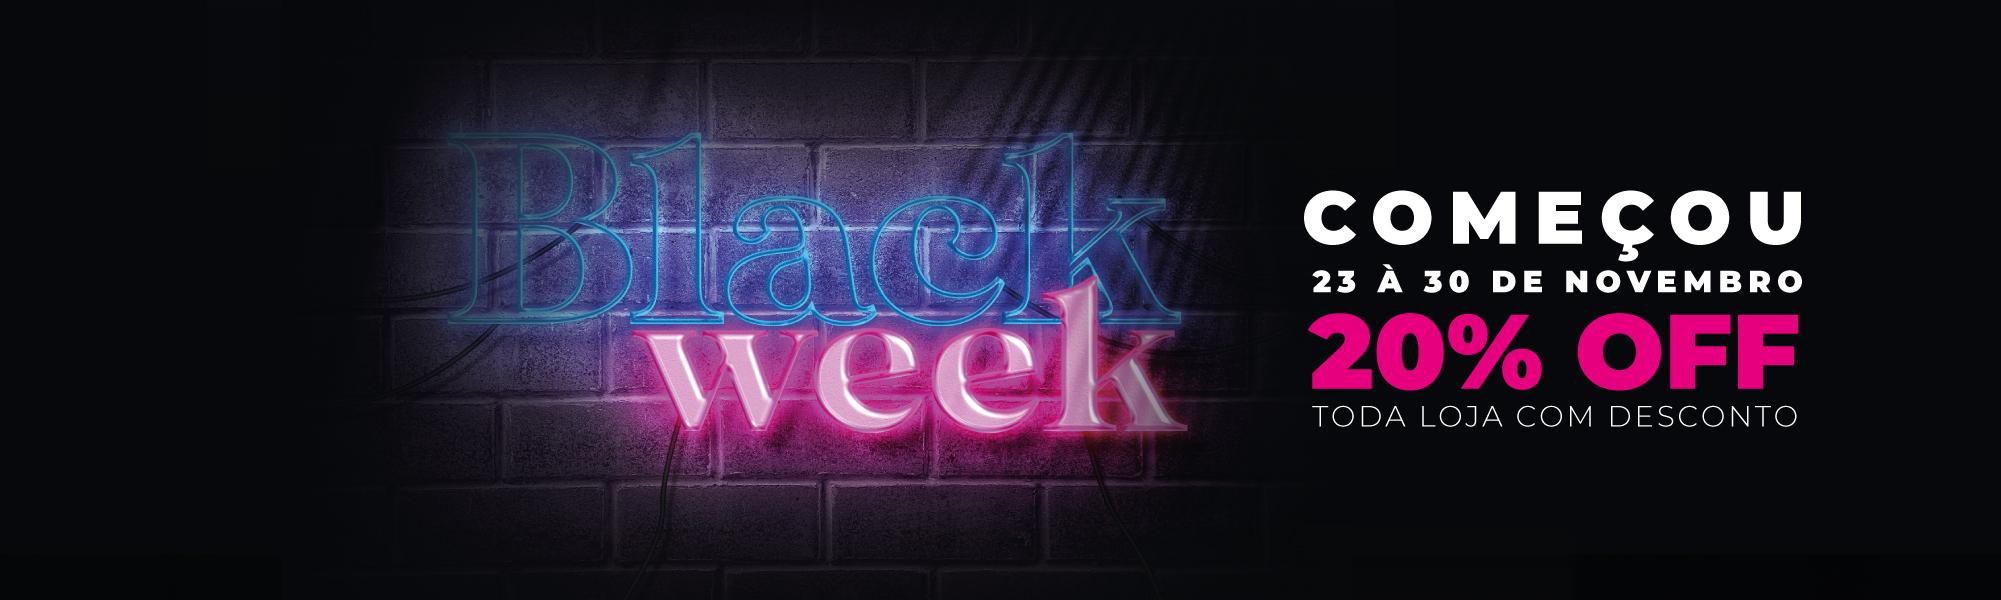 BLACK WEEK BOAZ